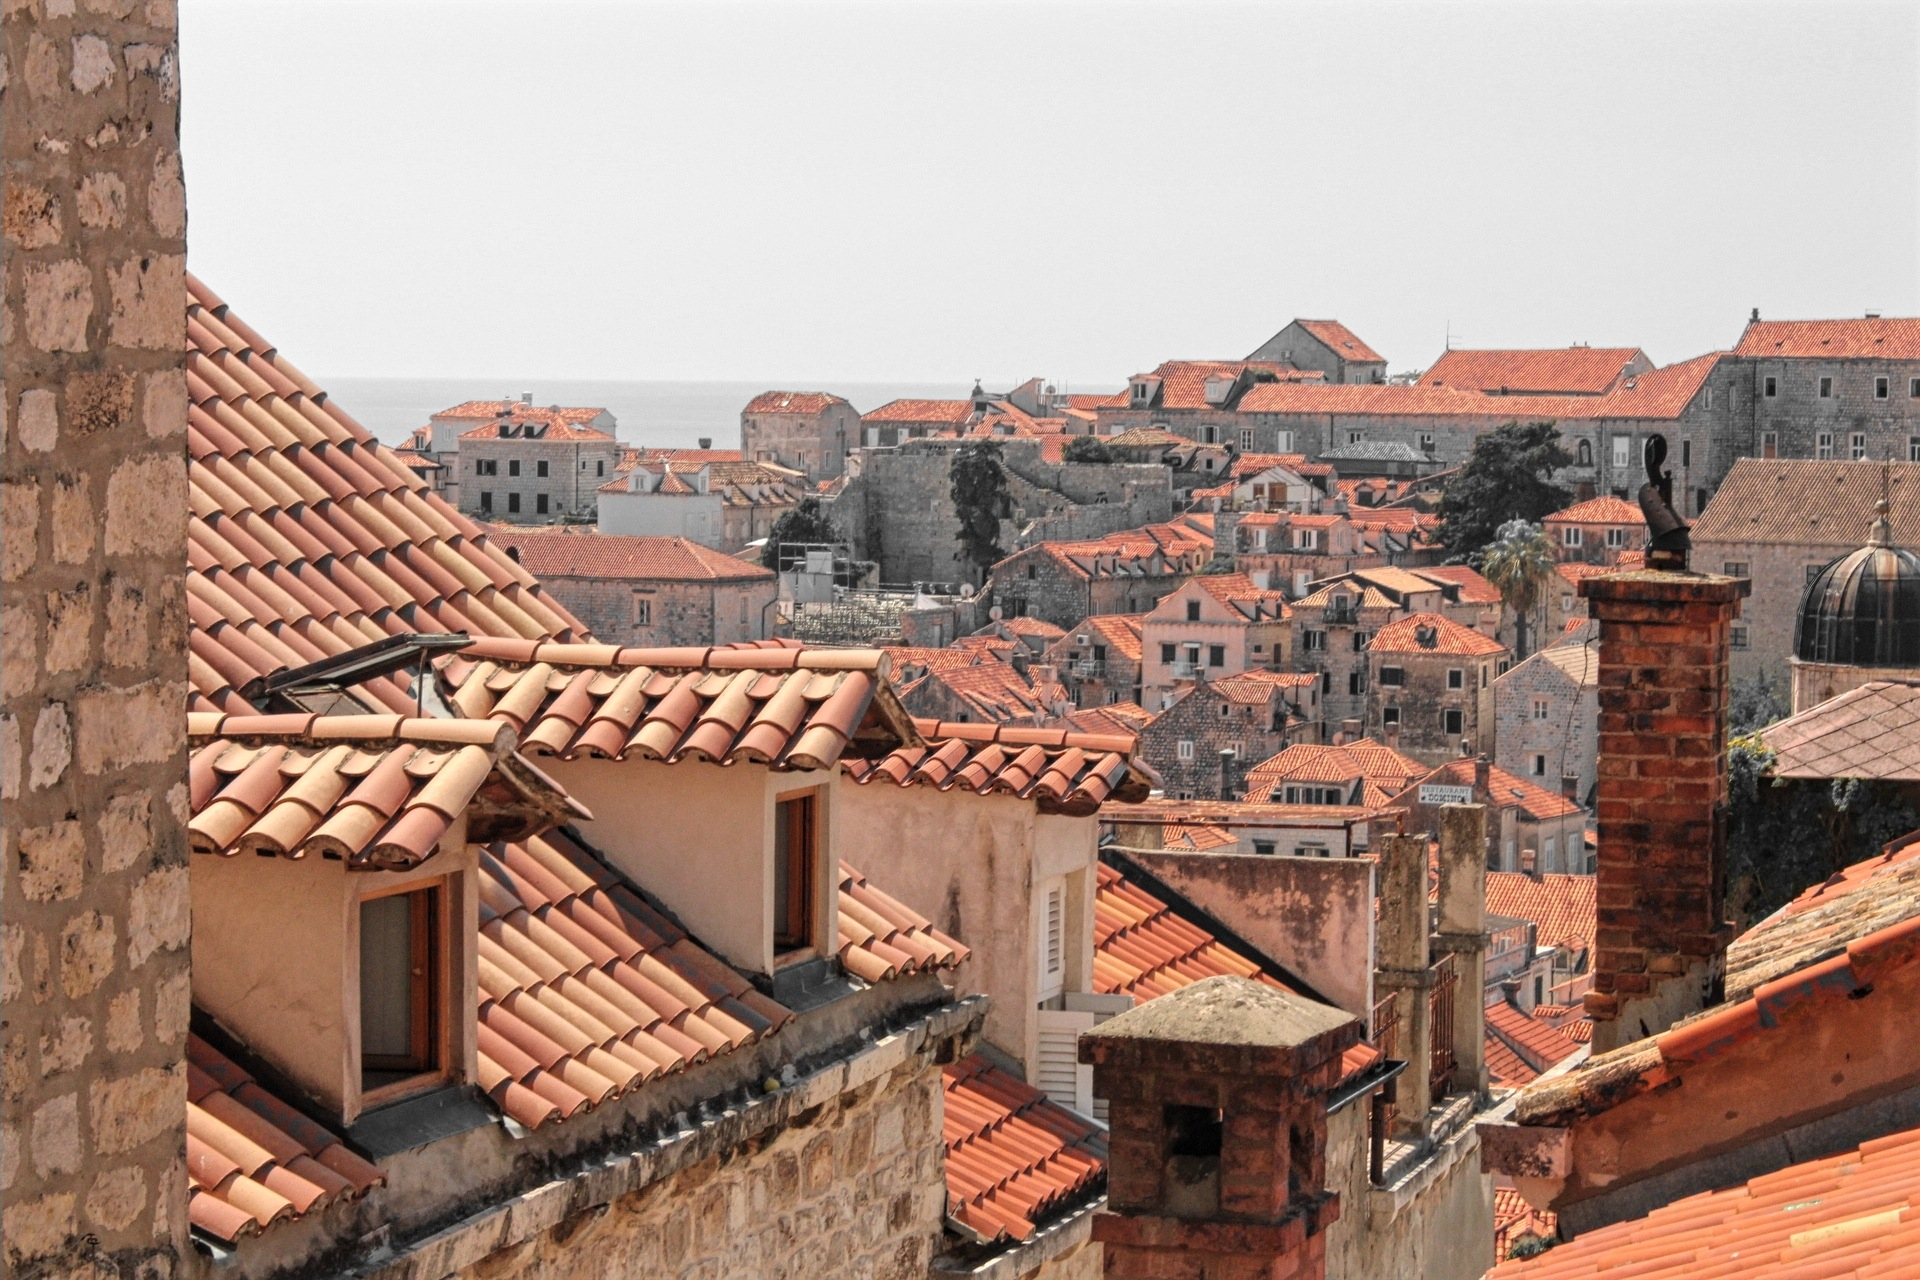 Dubrovnik's burnt rooftops by Aaron Blake